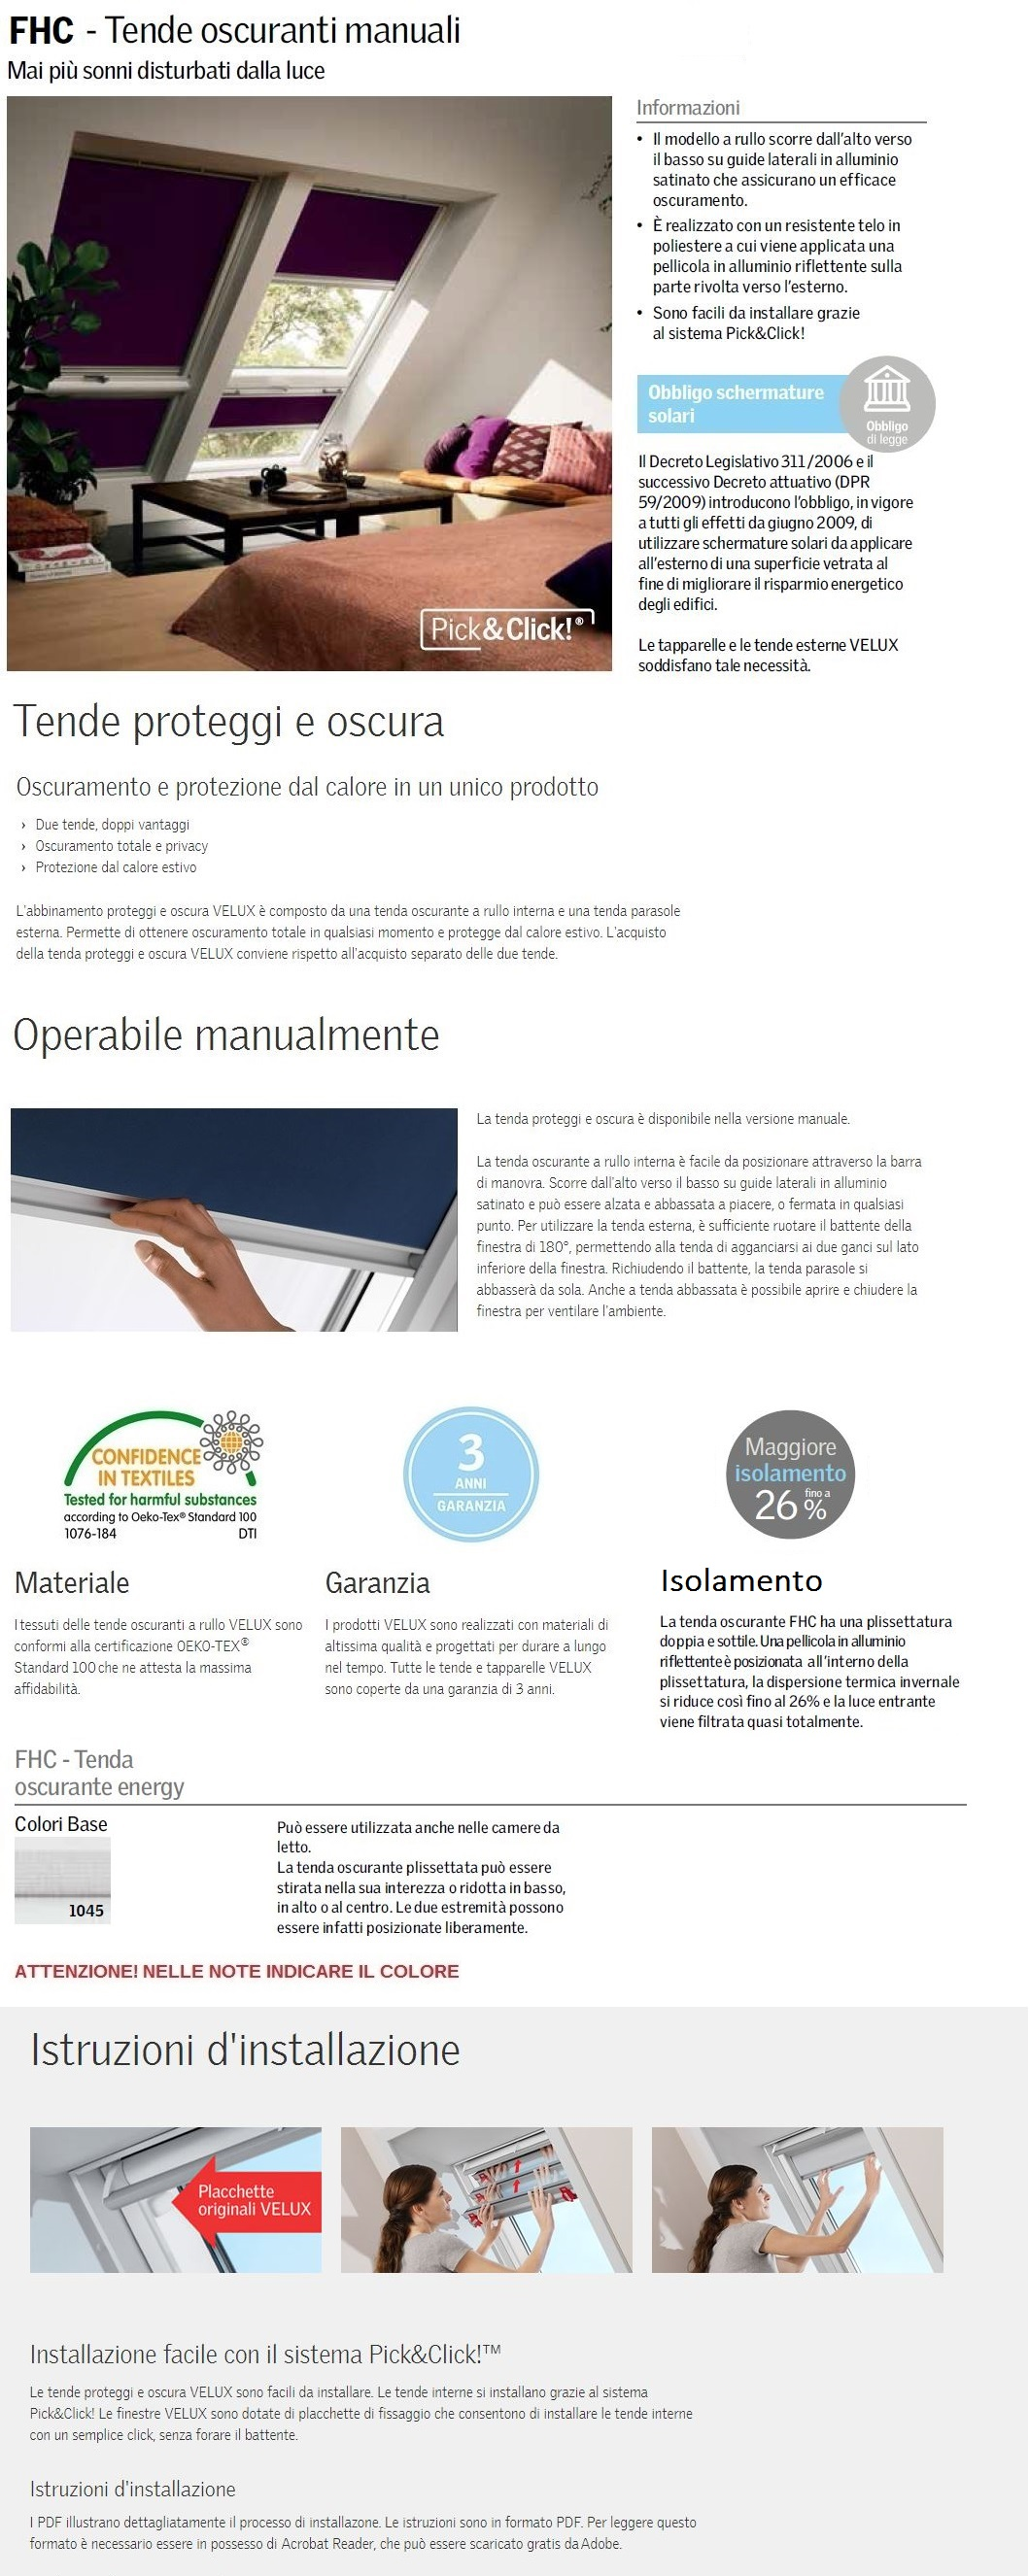 Tenda velux oscurante manuale fhc colori base maffei for Catalogo velux pdf